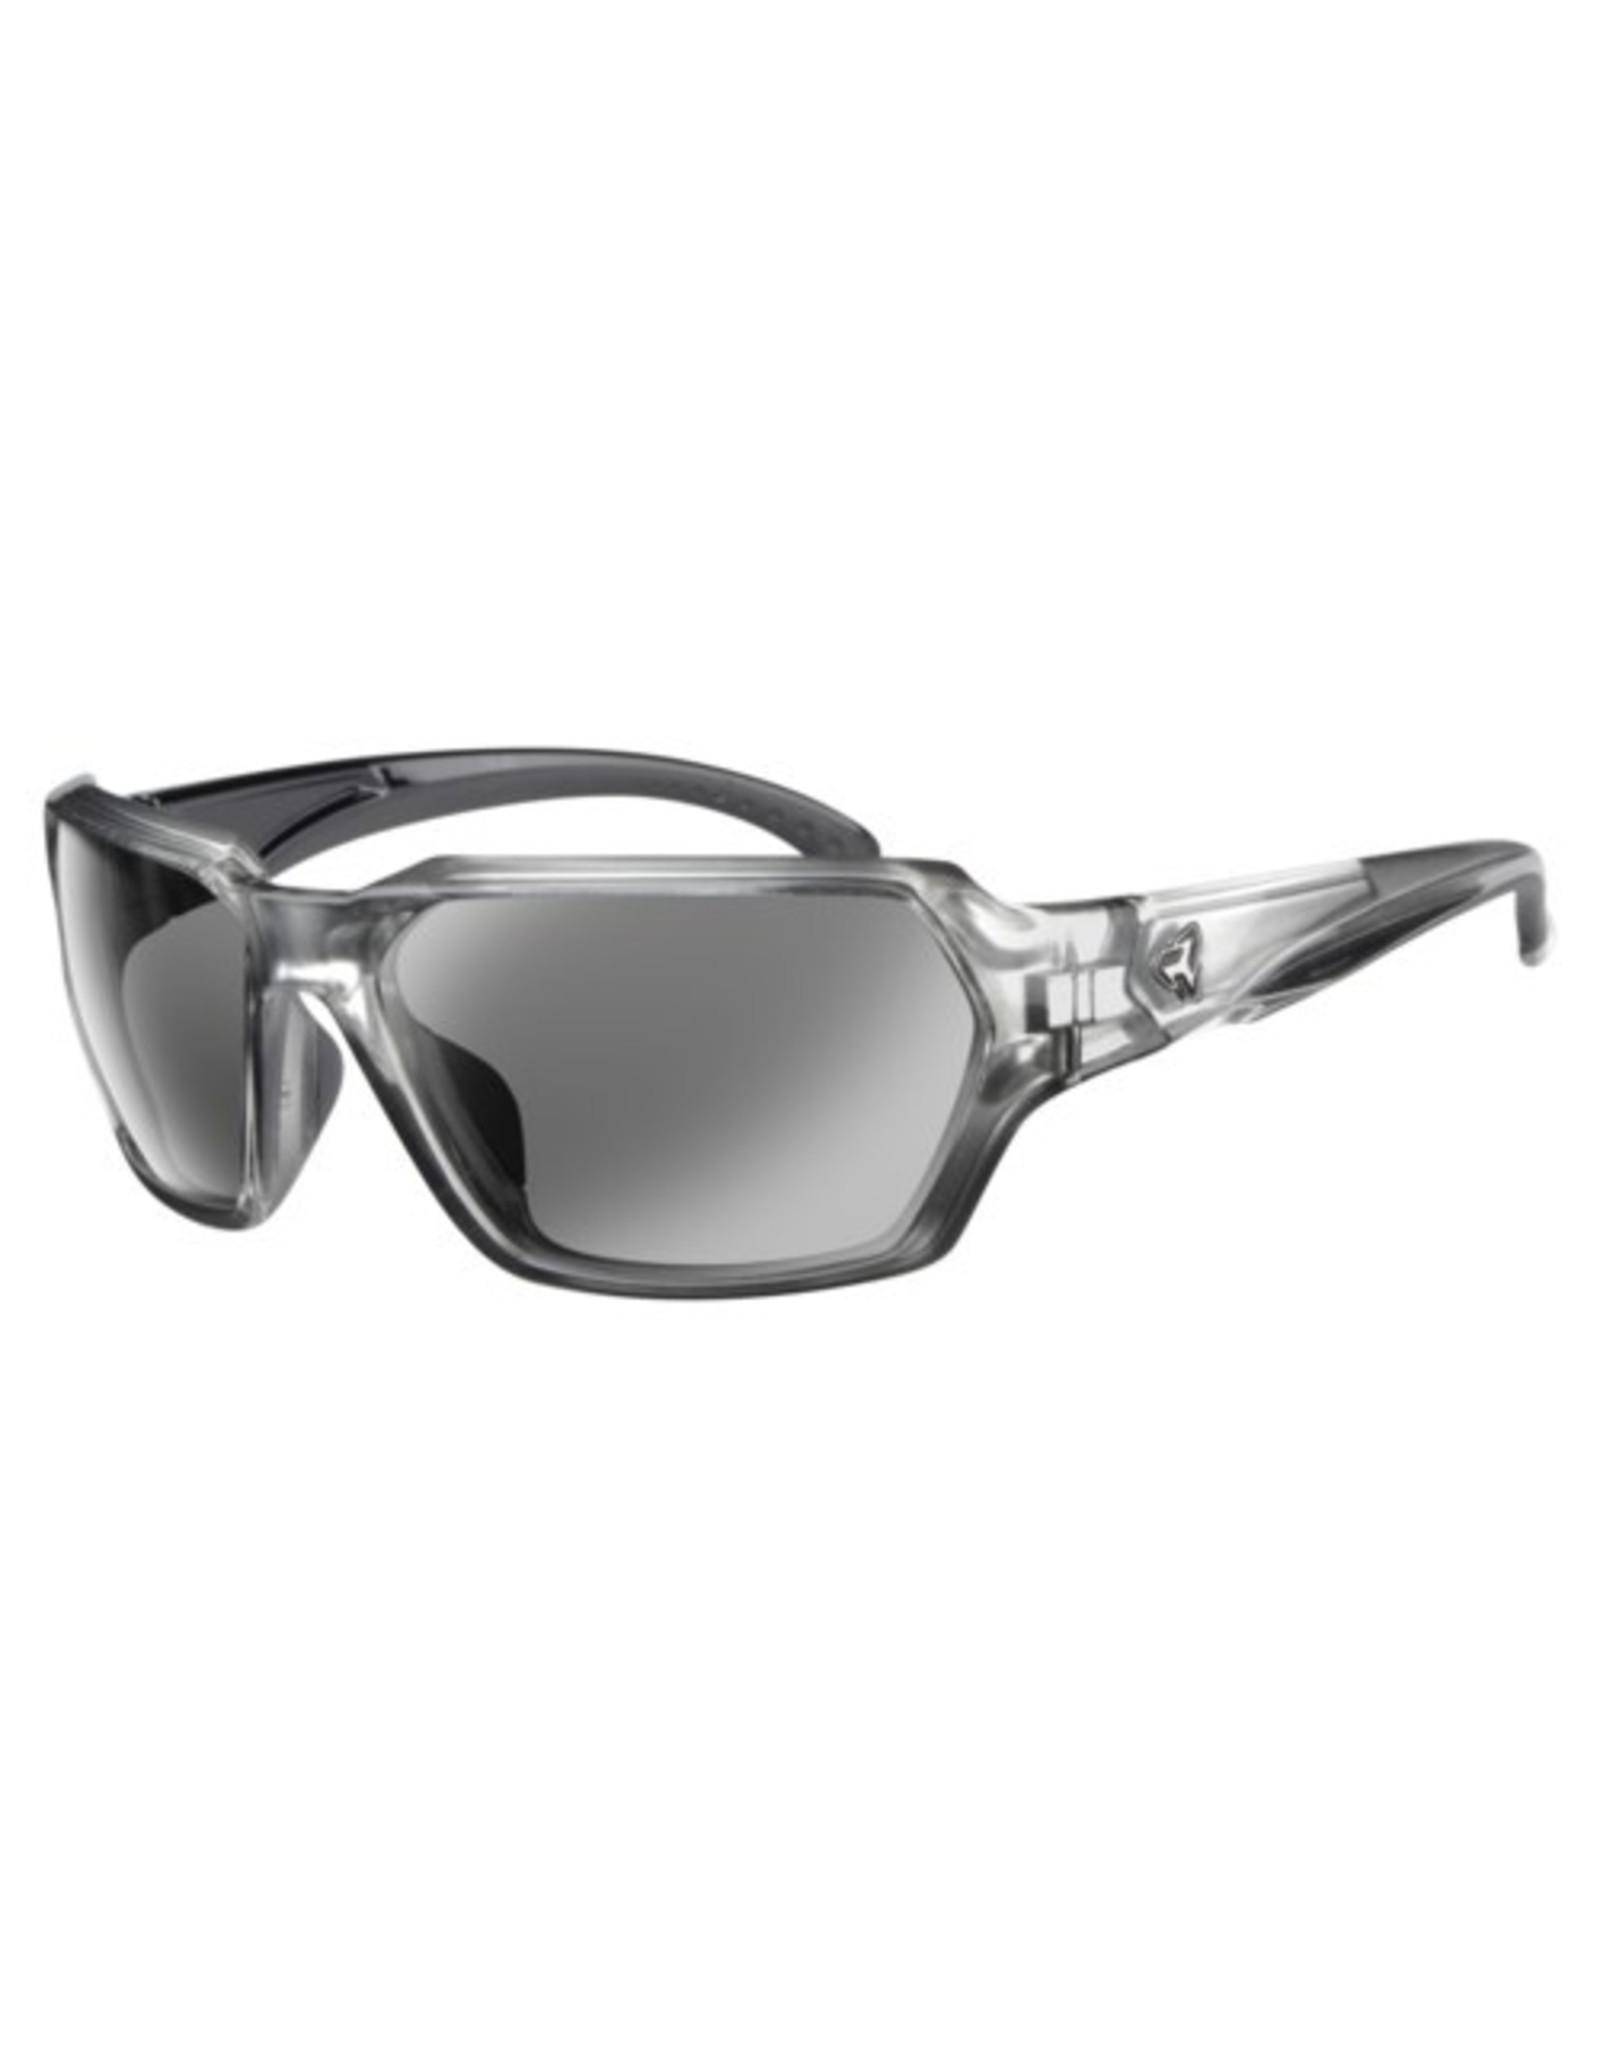 Ryders Eyewear - Face Poly Xtal Silver-Black/Grey Lens Silver FM